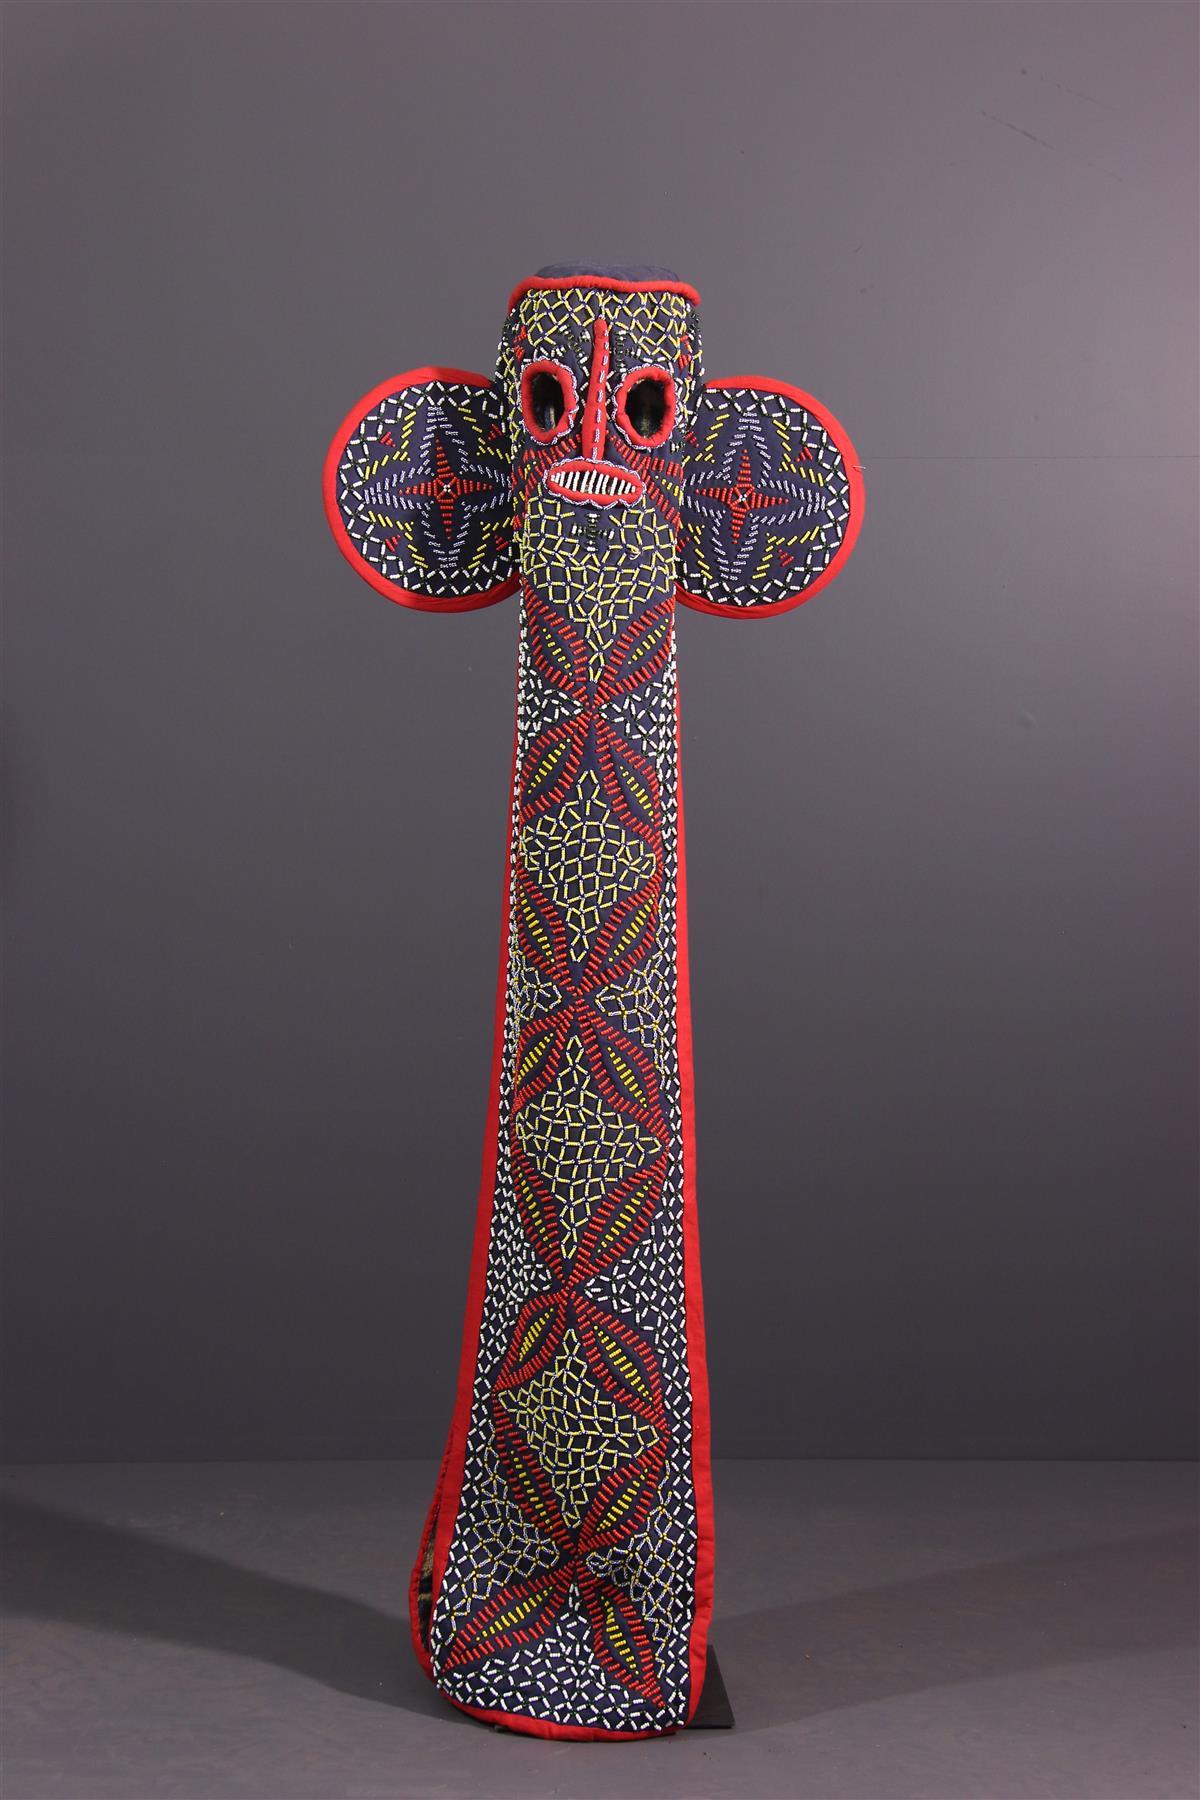 Masque éléphant Bamileke - Art africain